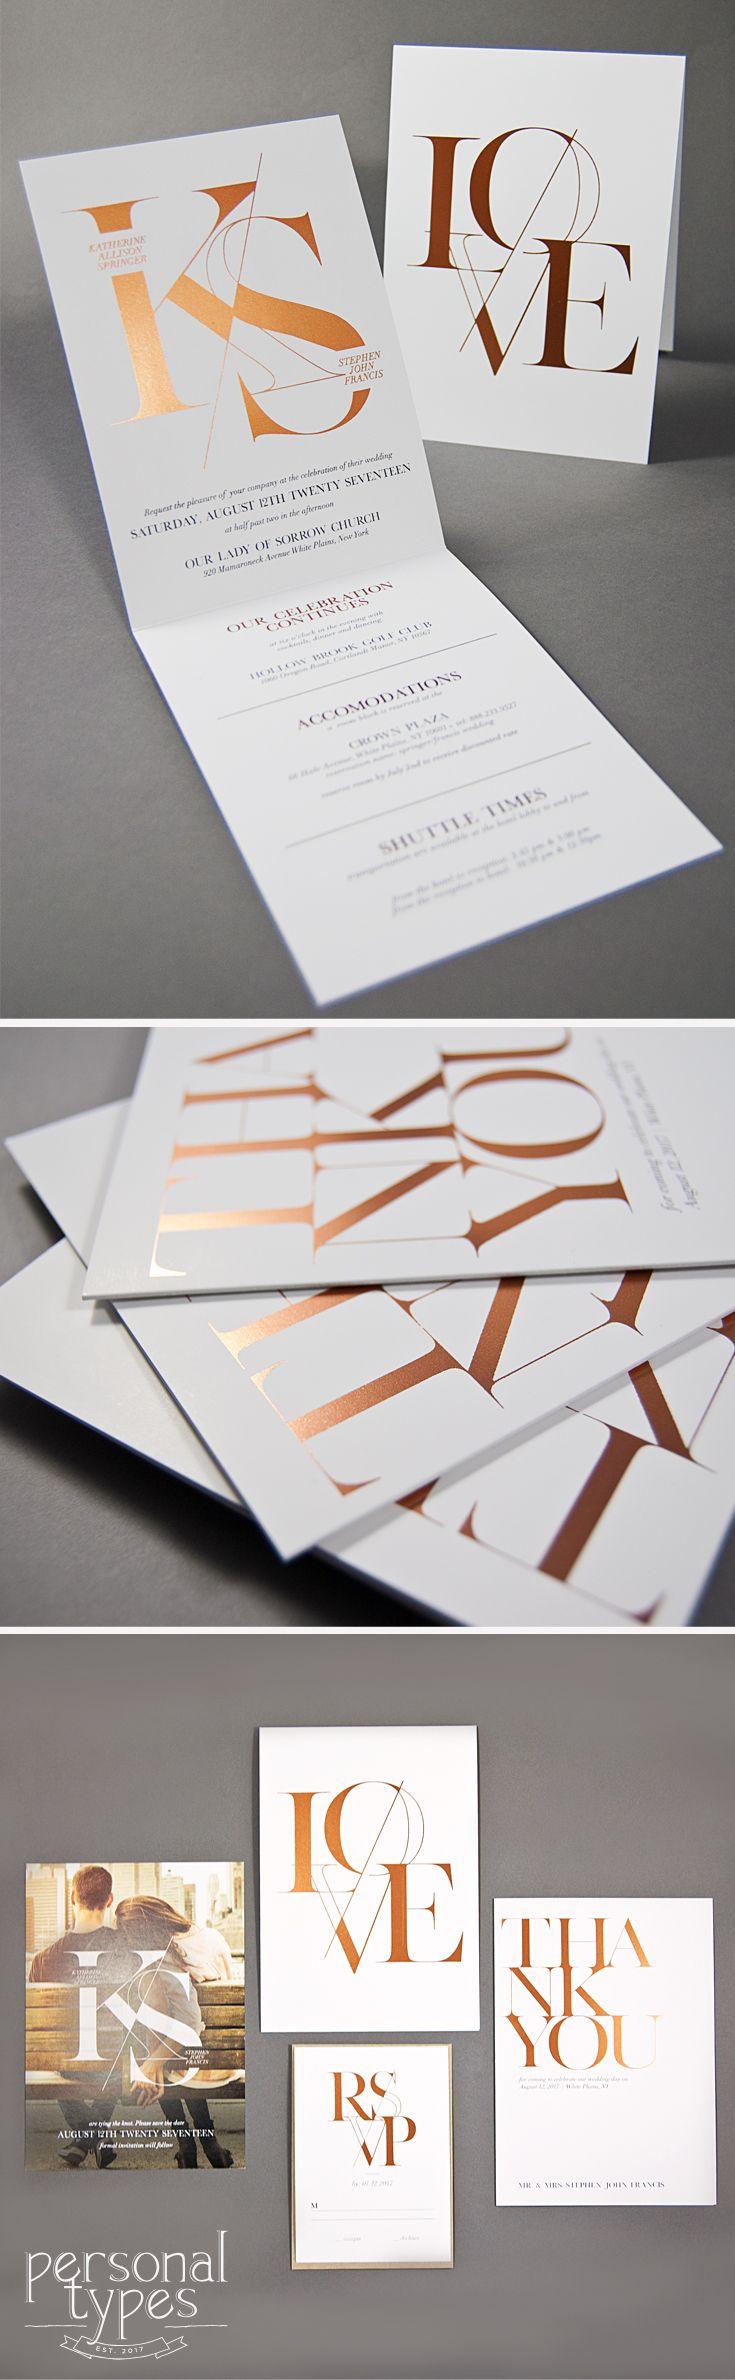 Modern Simple Type Rose Gold Foil Wedding Invitation https://www.etsy.com/shop/personaltypes?ref=l2-shopheader-name